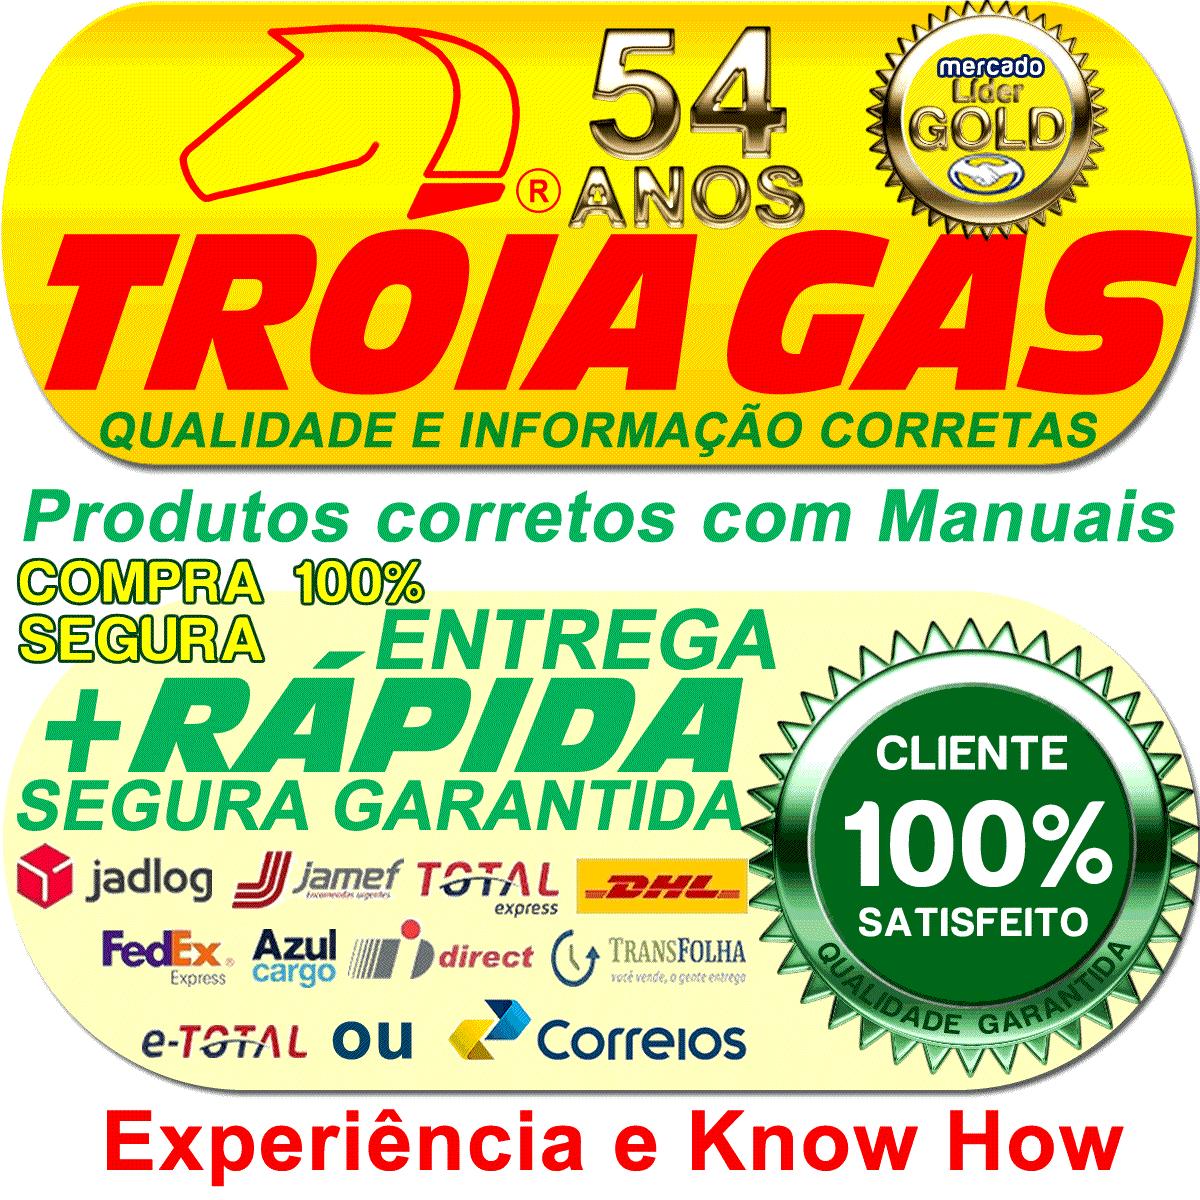 Simulador de Sonda Lambda Novo T634 TURY GAS